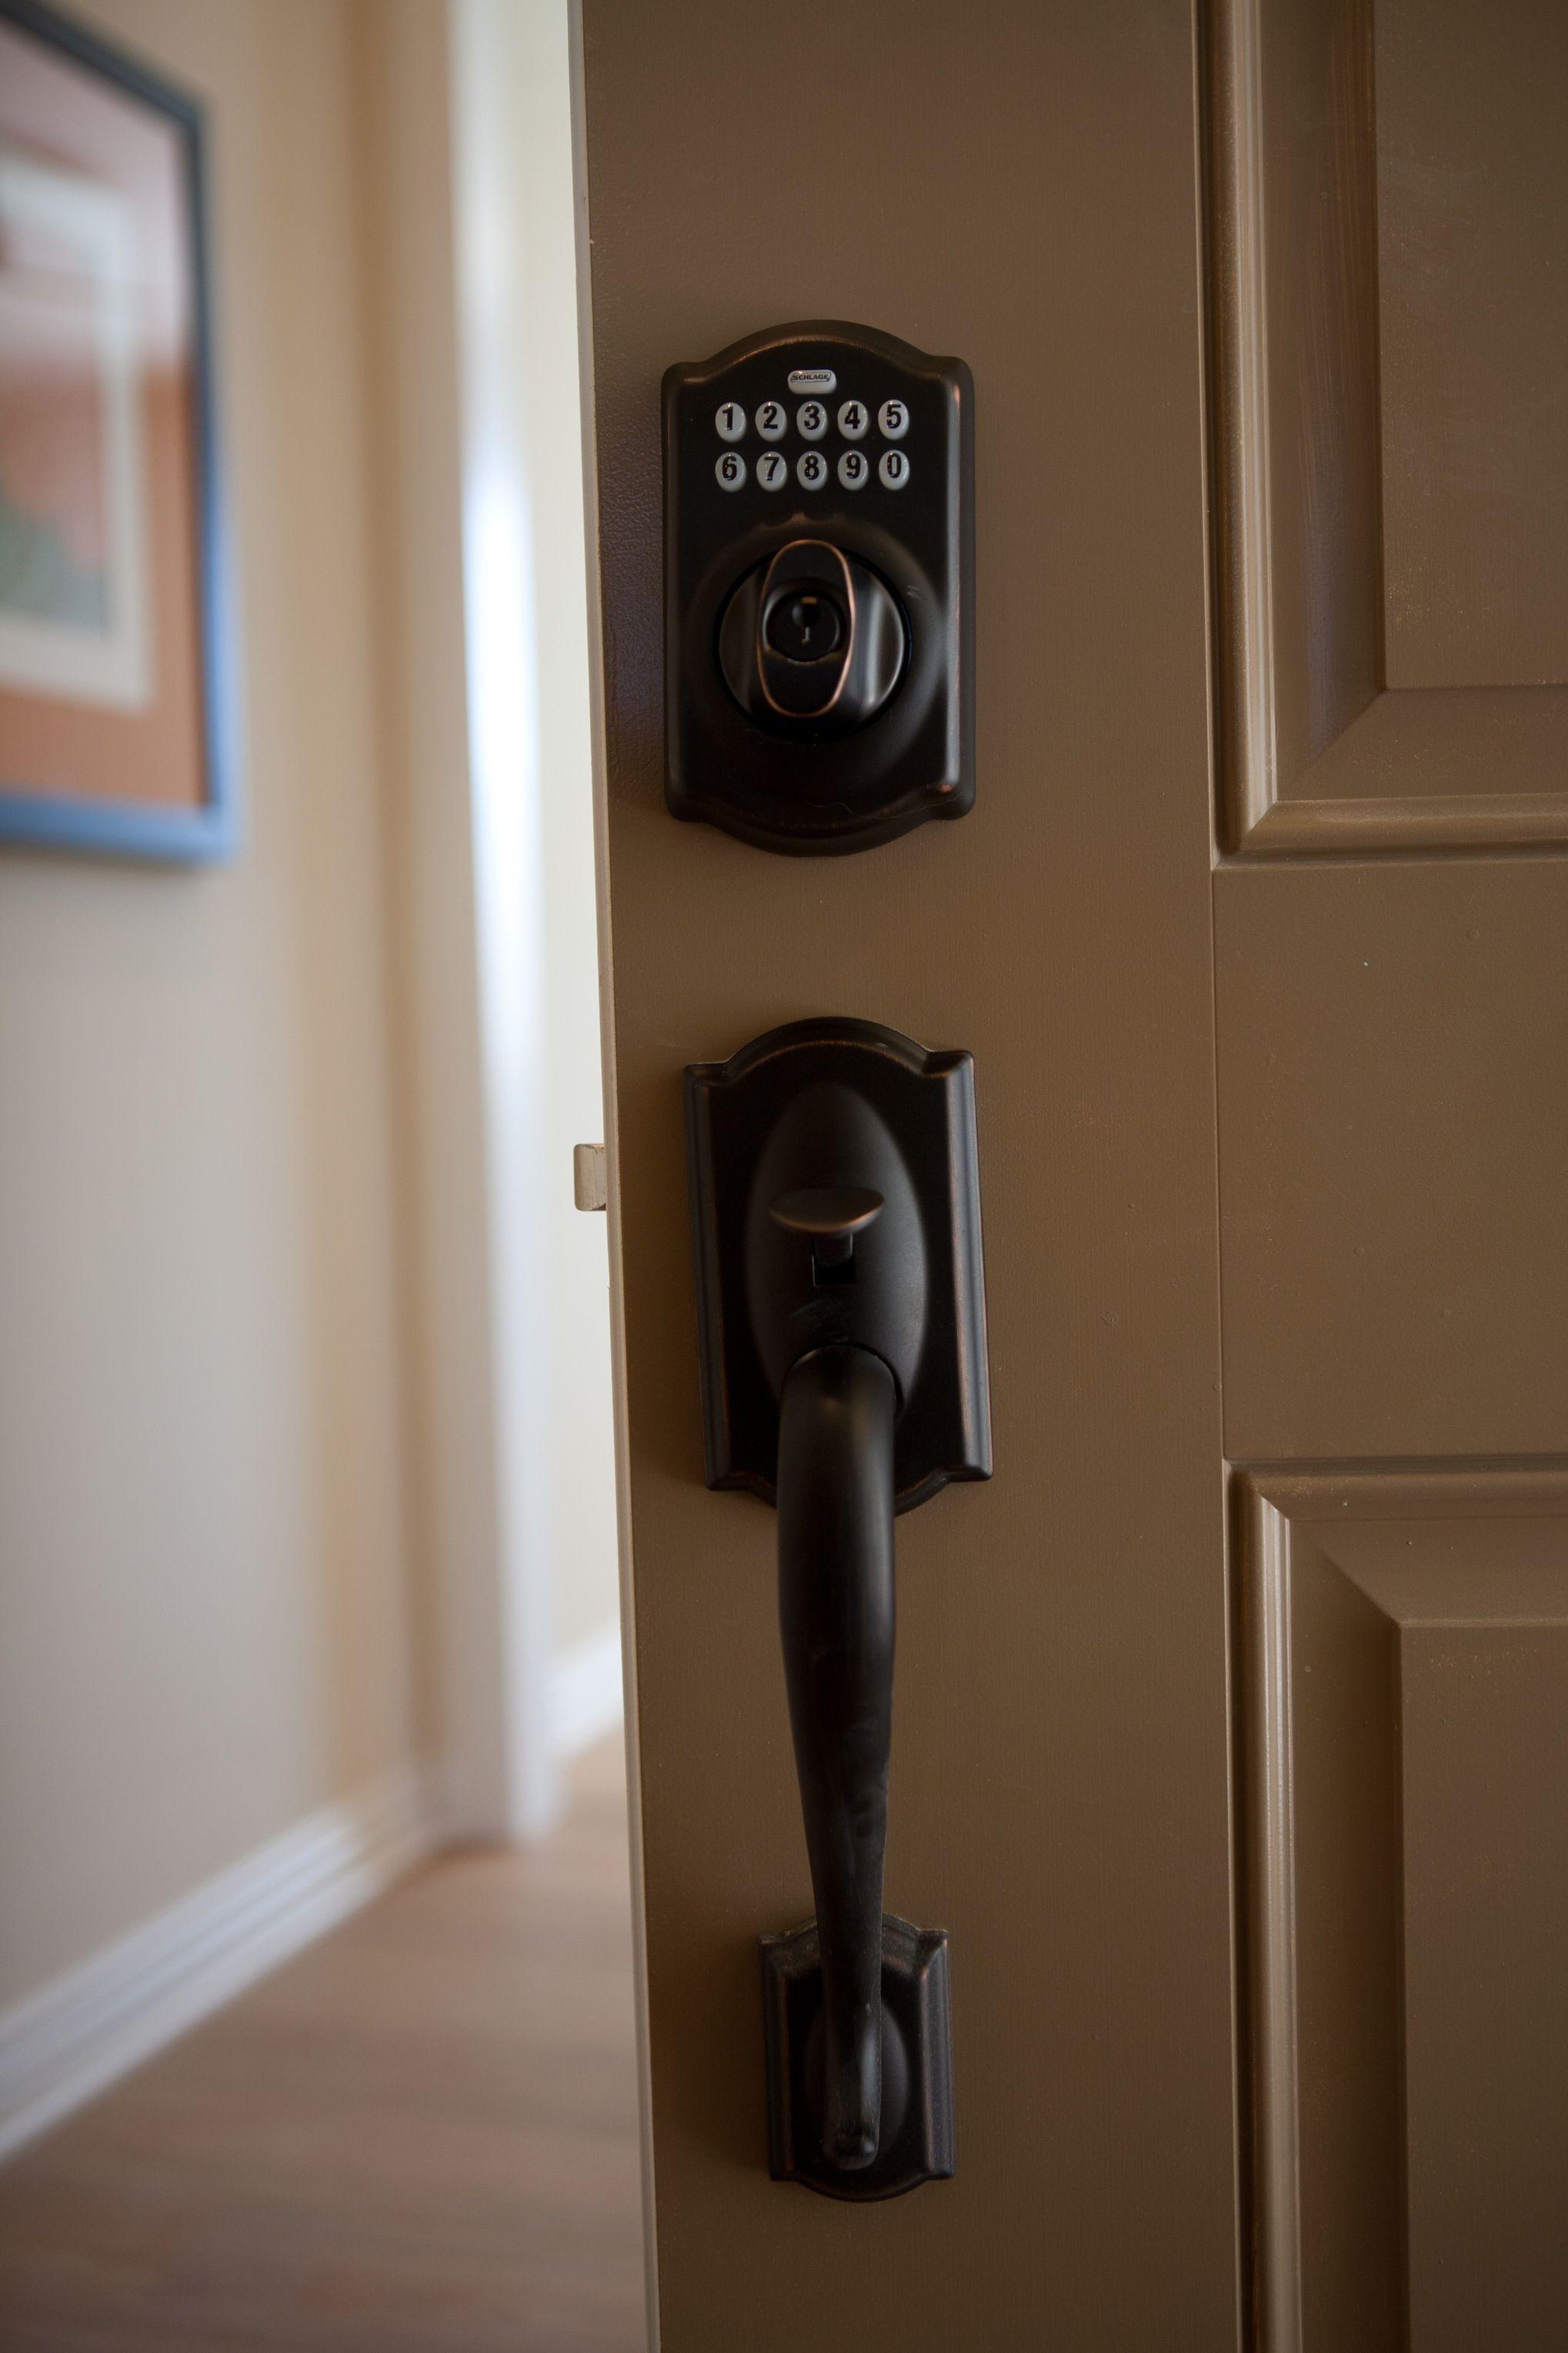 Oil rubbed bronze entry door knobs - Entry Door Nexia Hardware This Is Not Your Standard Oil Rubbed Bronze Entry Door